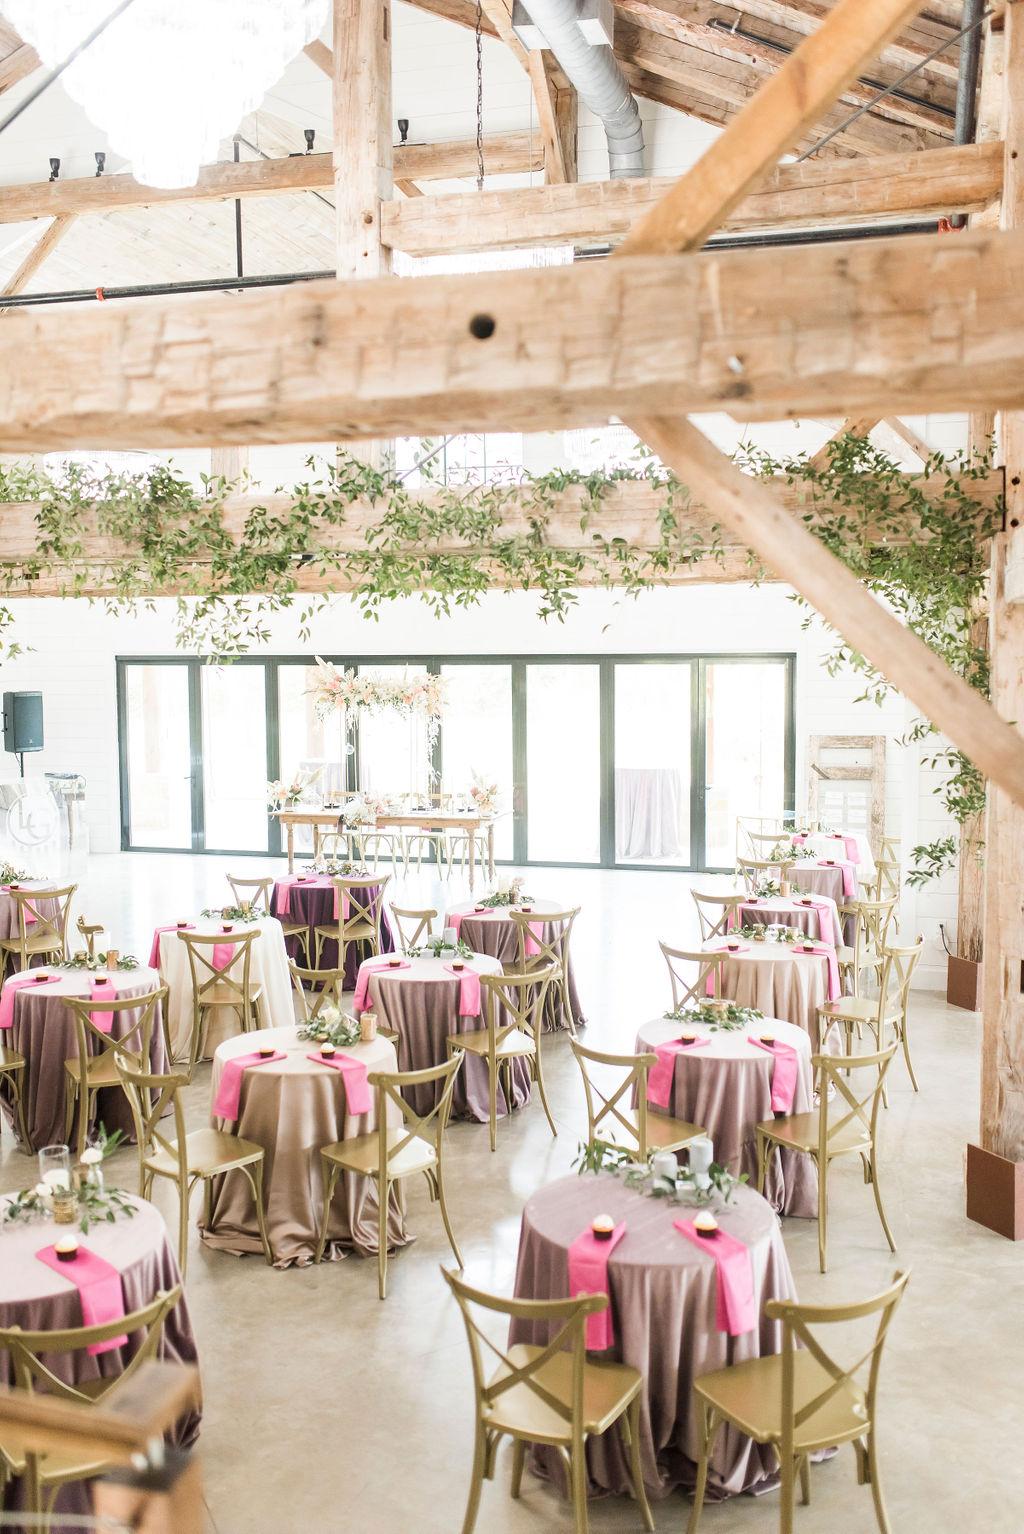 THE MEEKERMARK LAYOUT VELVET WEDDING INSPIRATION EPOCH CO AUSTIN WEDDING PLANNER